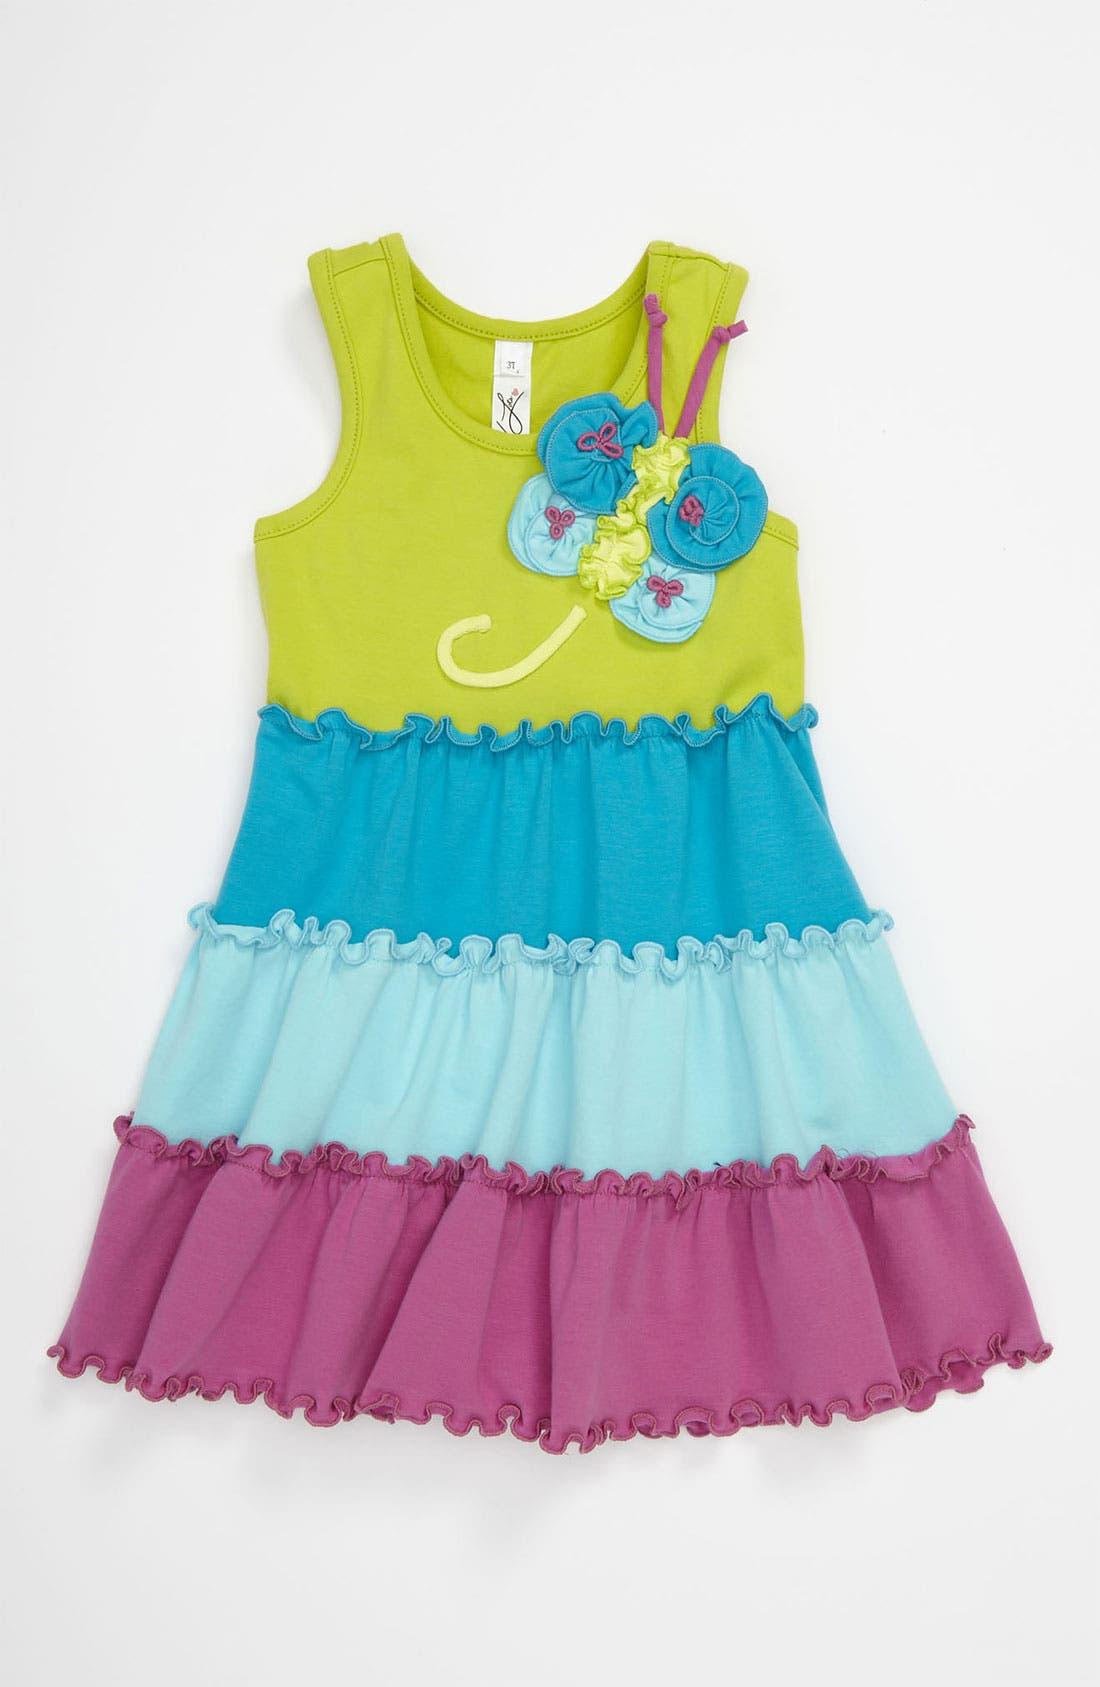 Main Image - Love U Lots 'Flower Butterfly' Dress (Toddler)